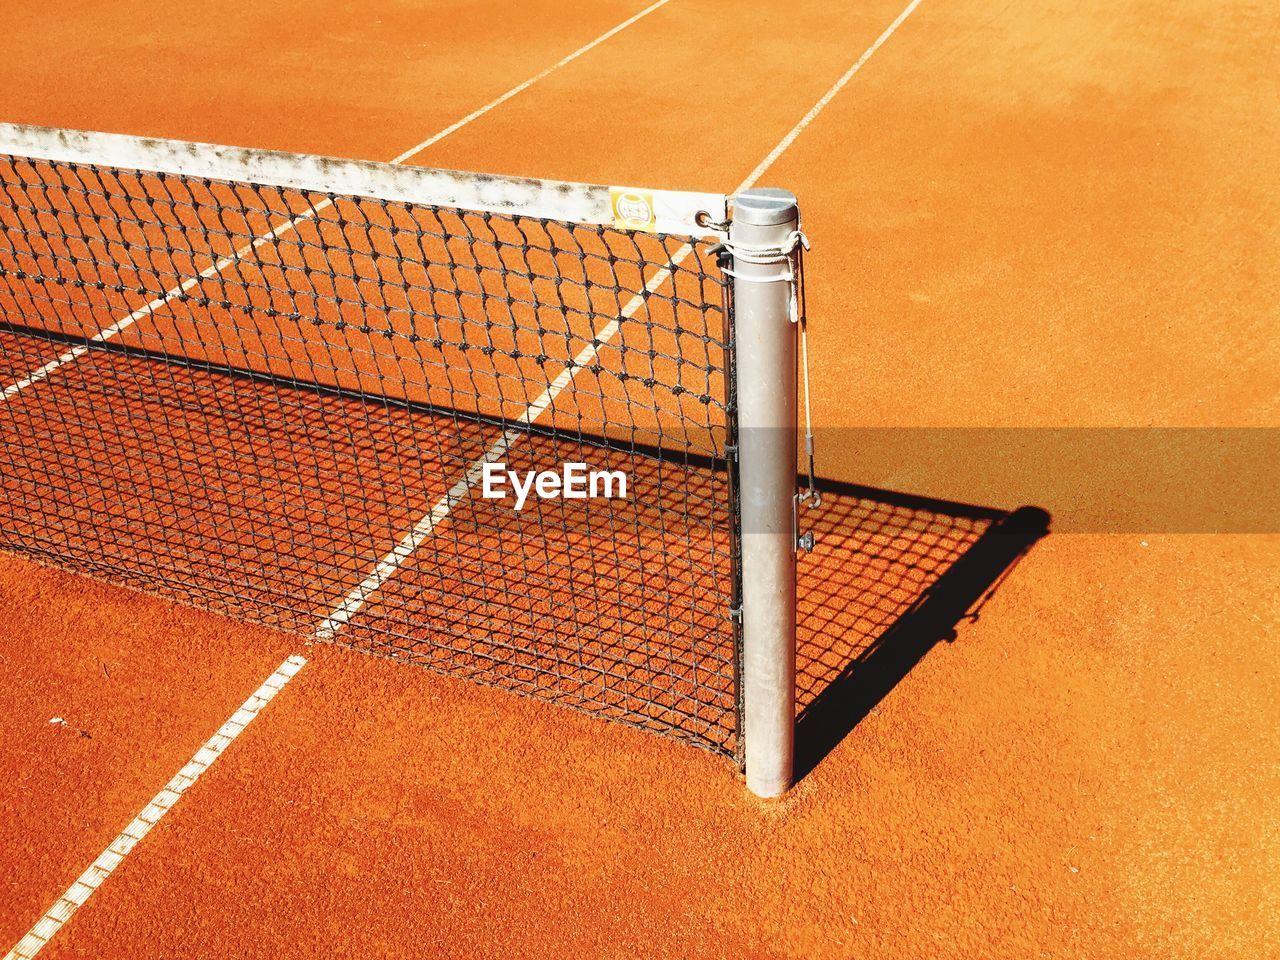 Cropped Tennis Net